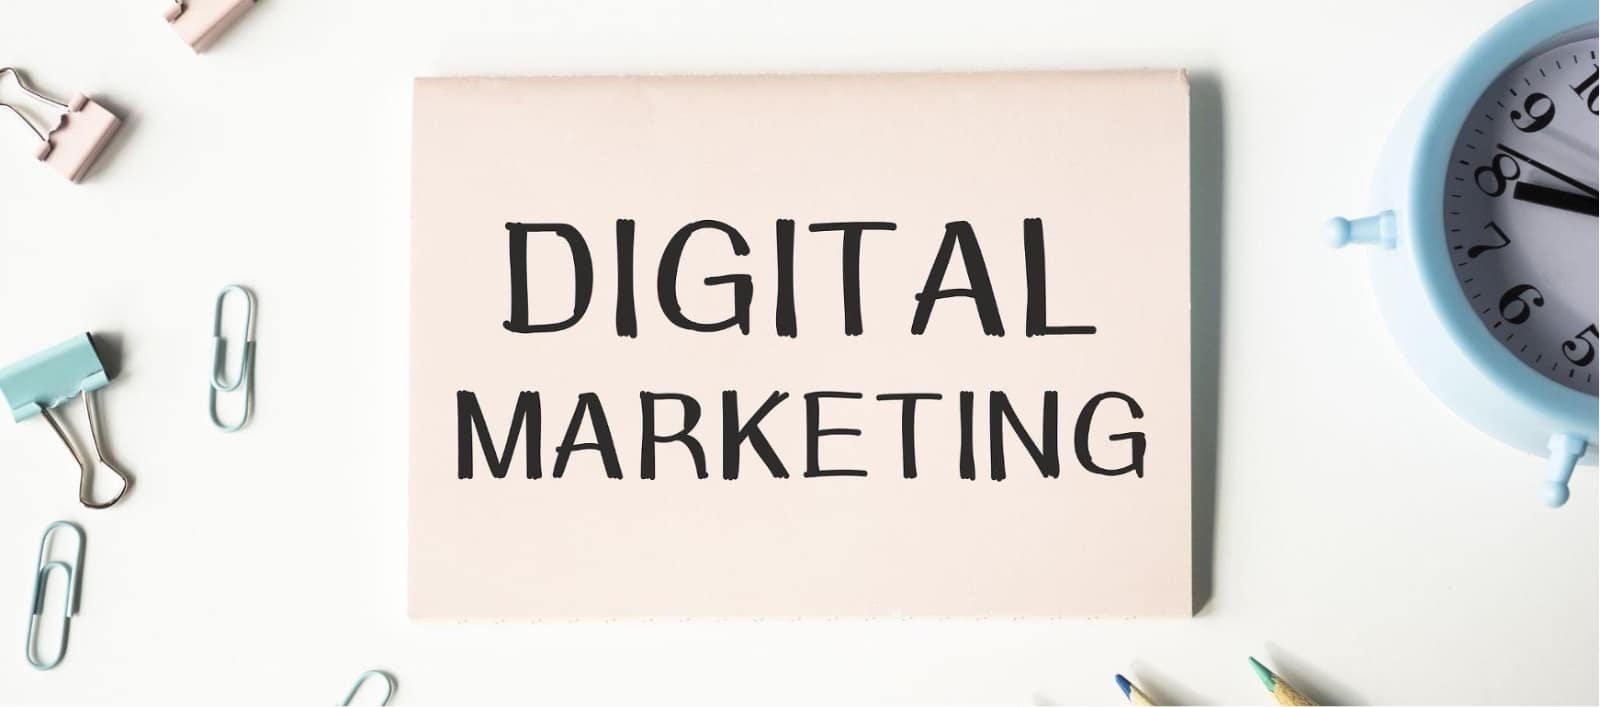 Digital Marketing - IMM Blog Image